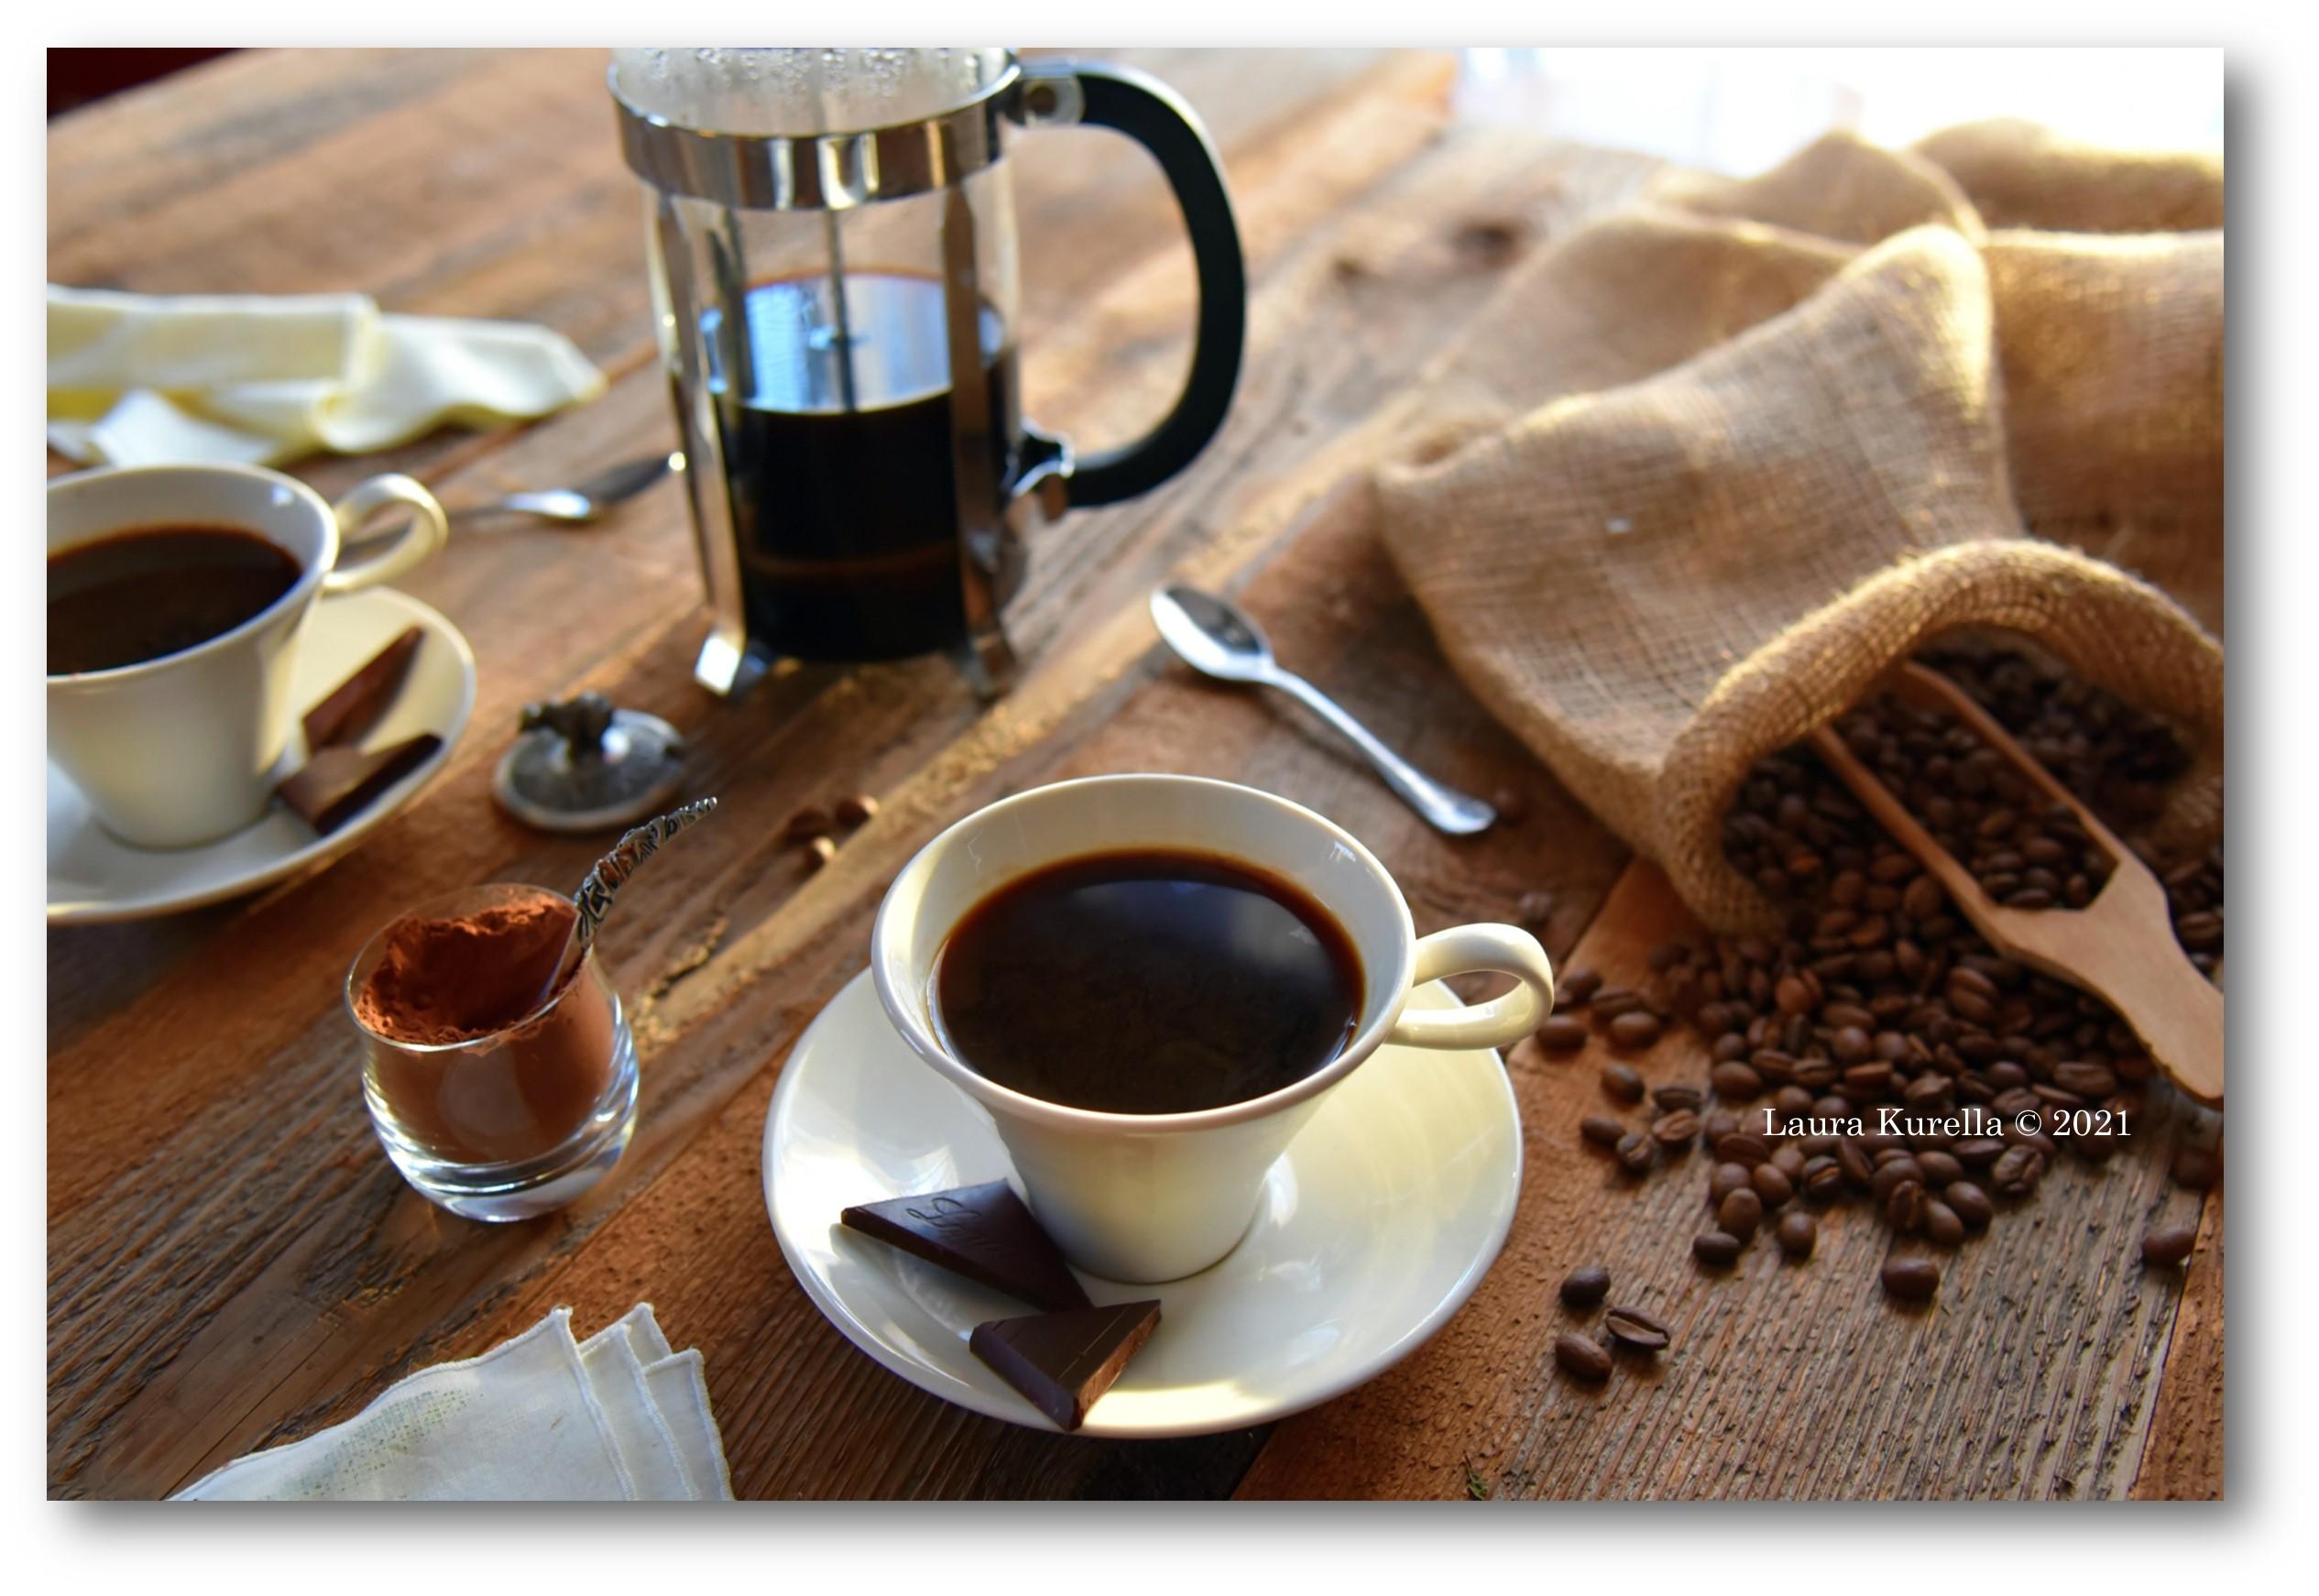 Incredible Coffee and Chocolate